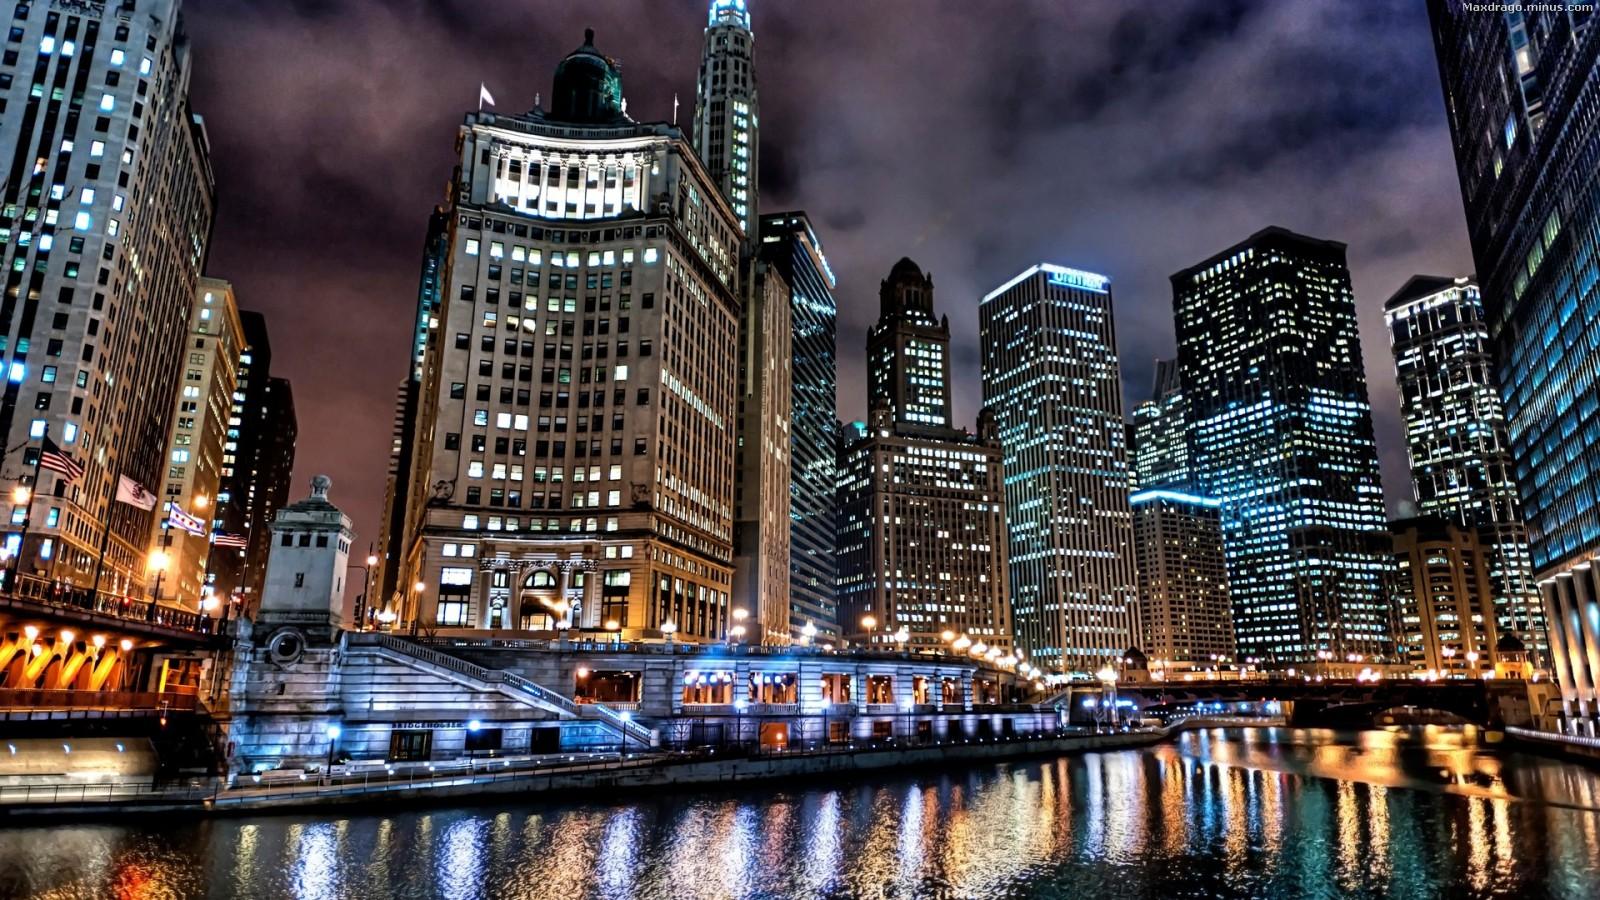 39 Chicago Night Skyline Wallpaper On Wallpapersafari